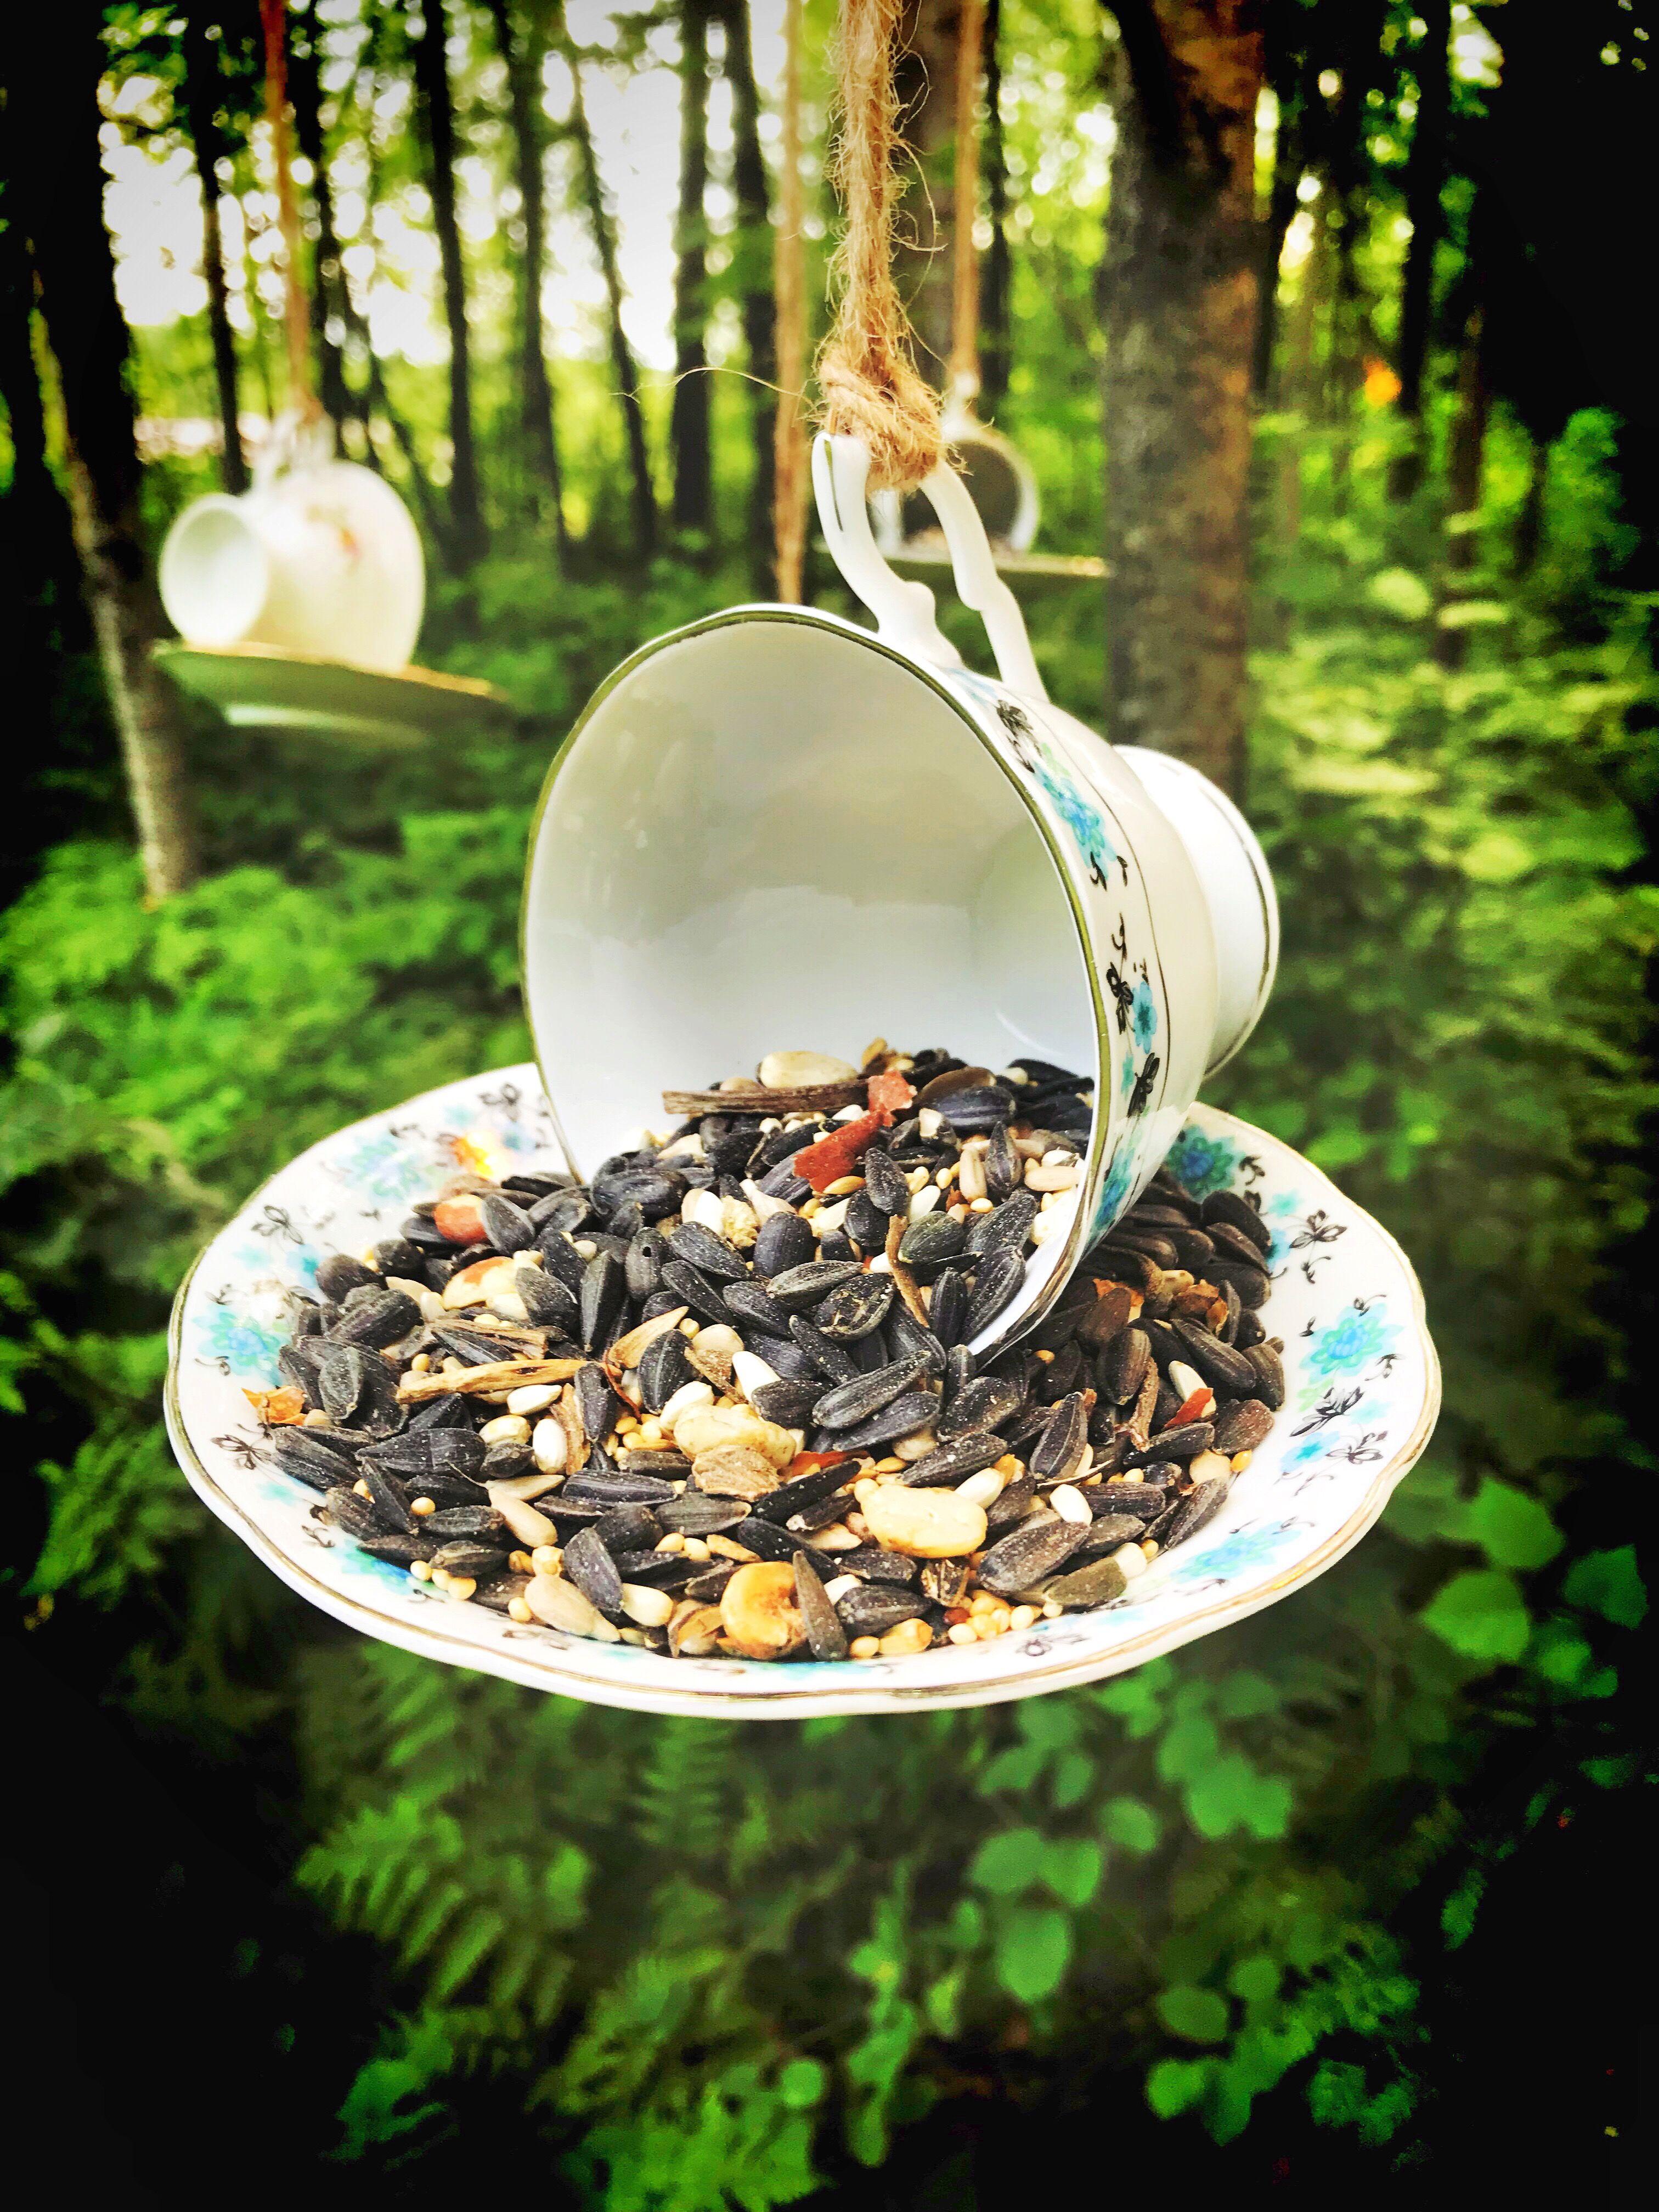 Tea cup bird feeders (With images) Tea cup bird feeder